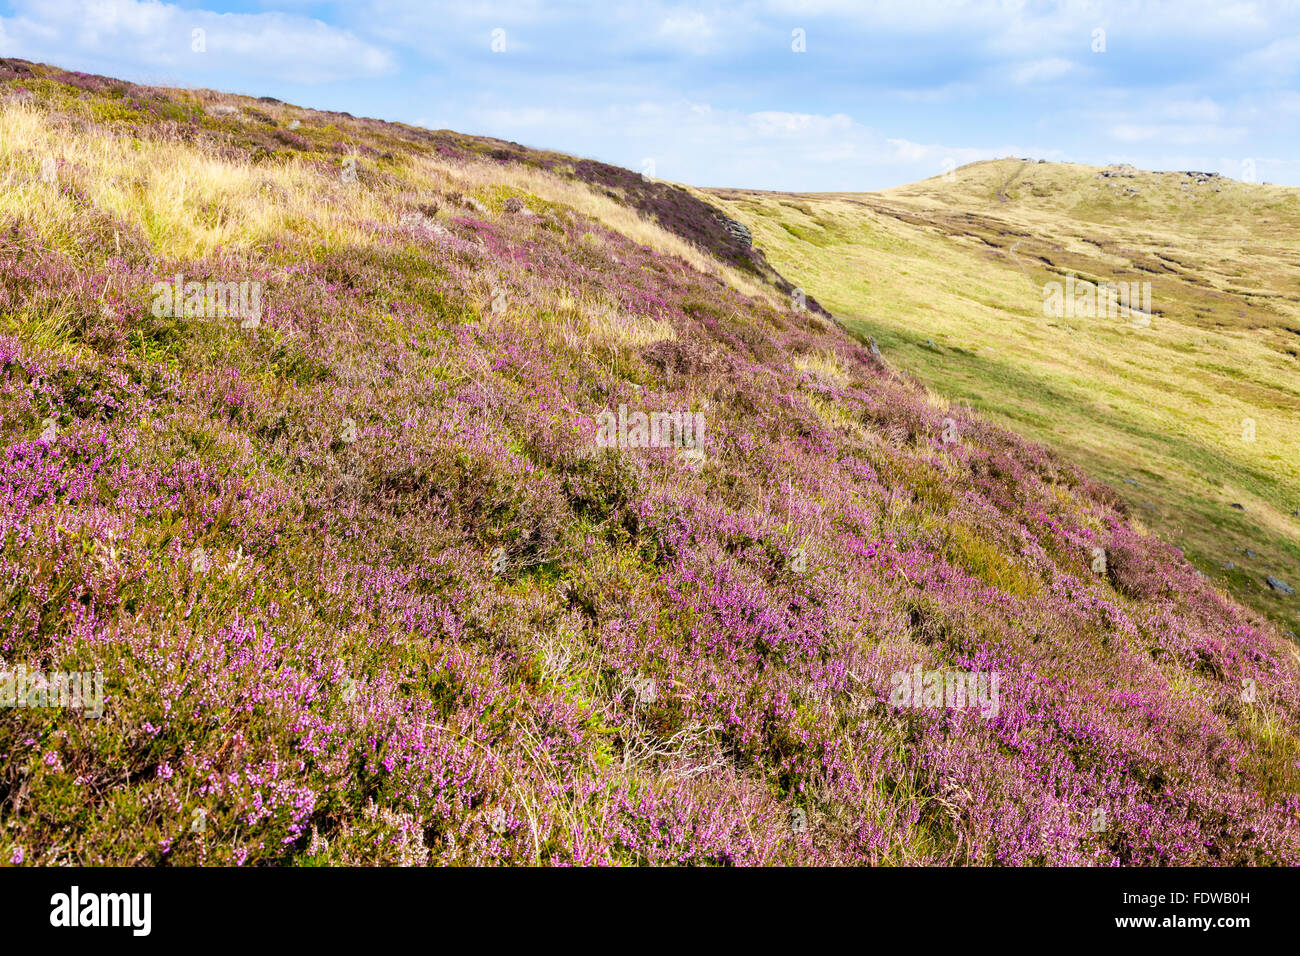 Heather (Calluna vulgaris) on the southern edge of Kinder Scout, Derbyshire, Peak District National Park, England, - Stock Image